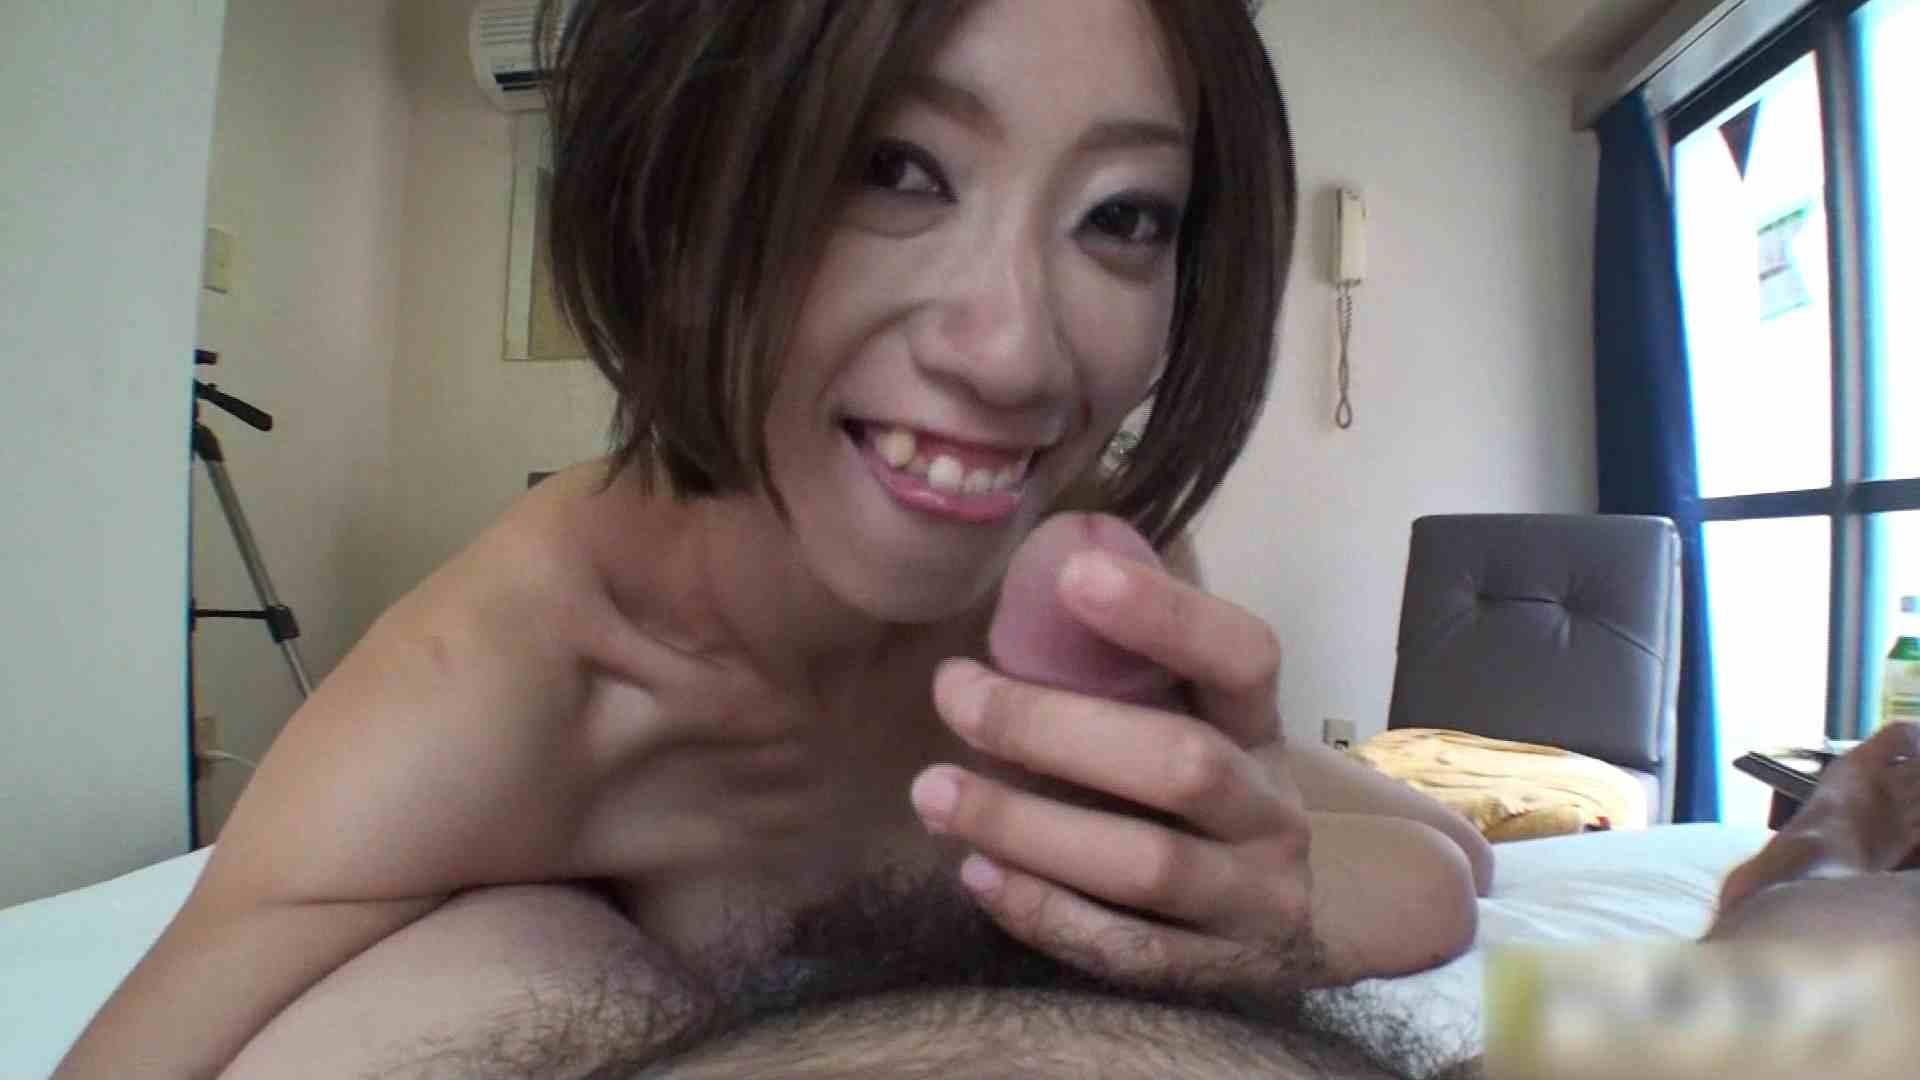 S級厳選美女ビッチガールVol.46 美女のヌード  60画像 25